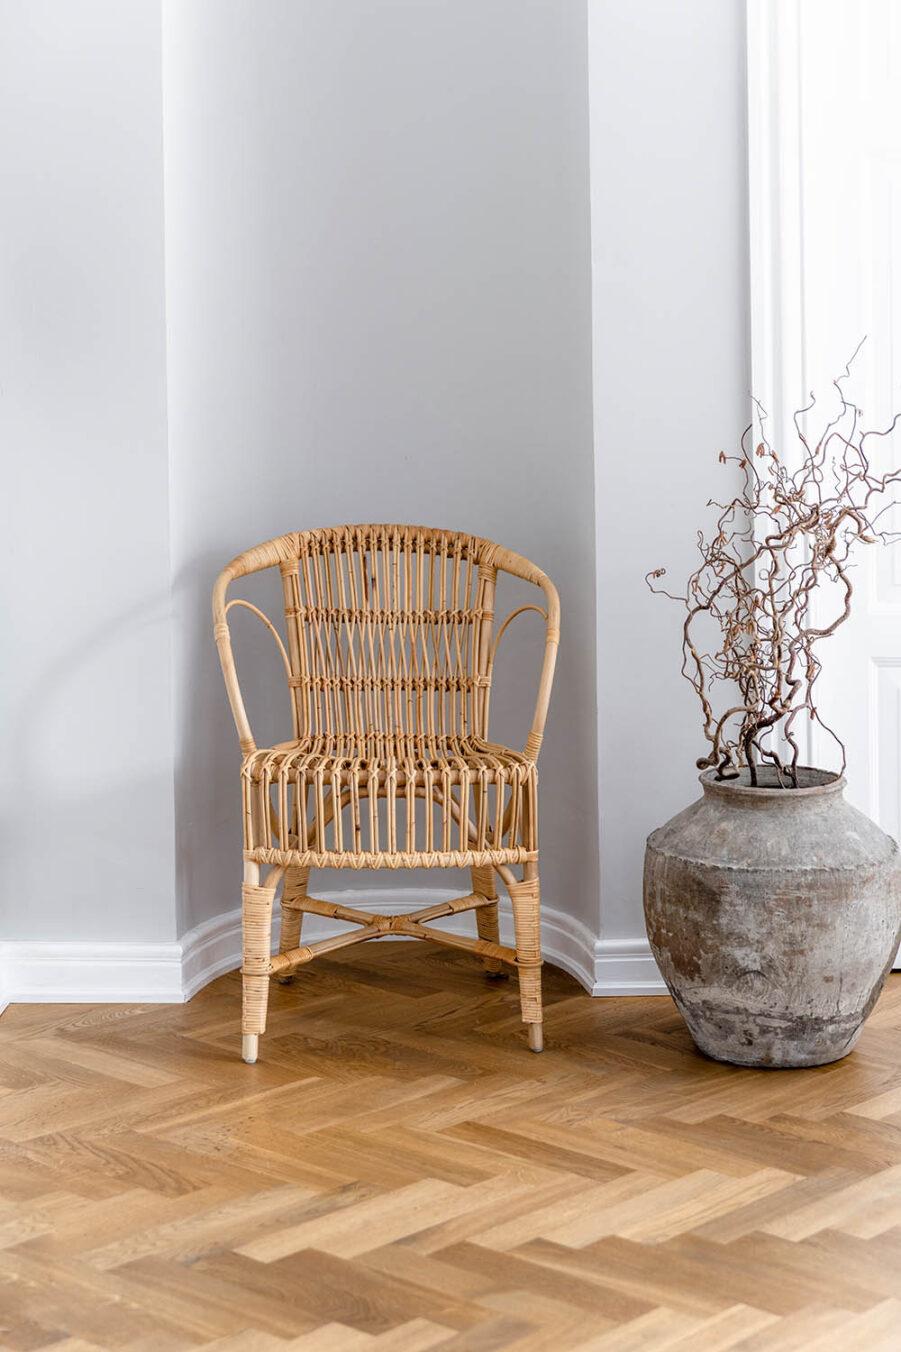 Sika-Design Wengler stol natur